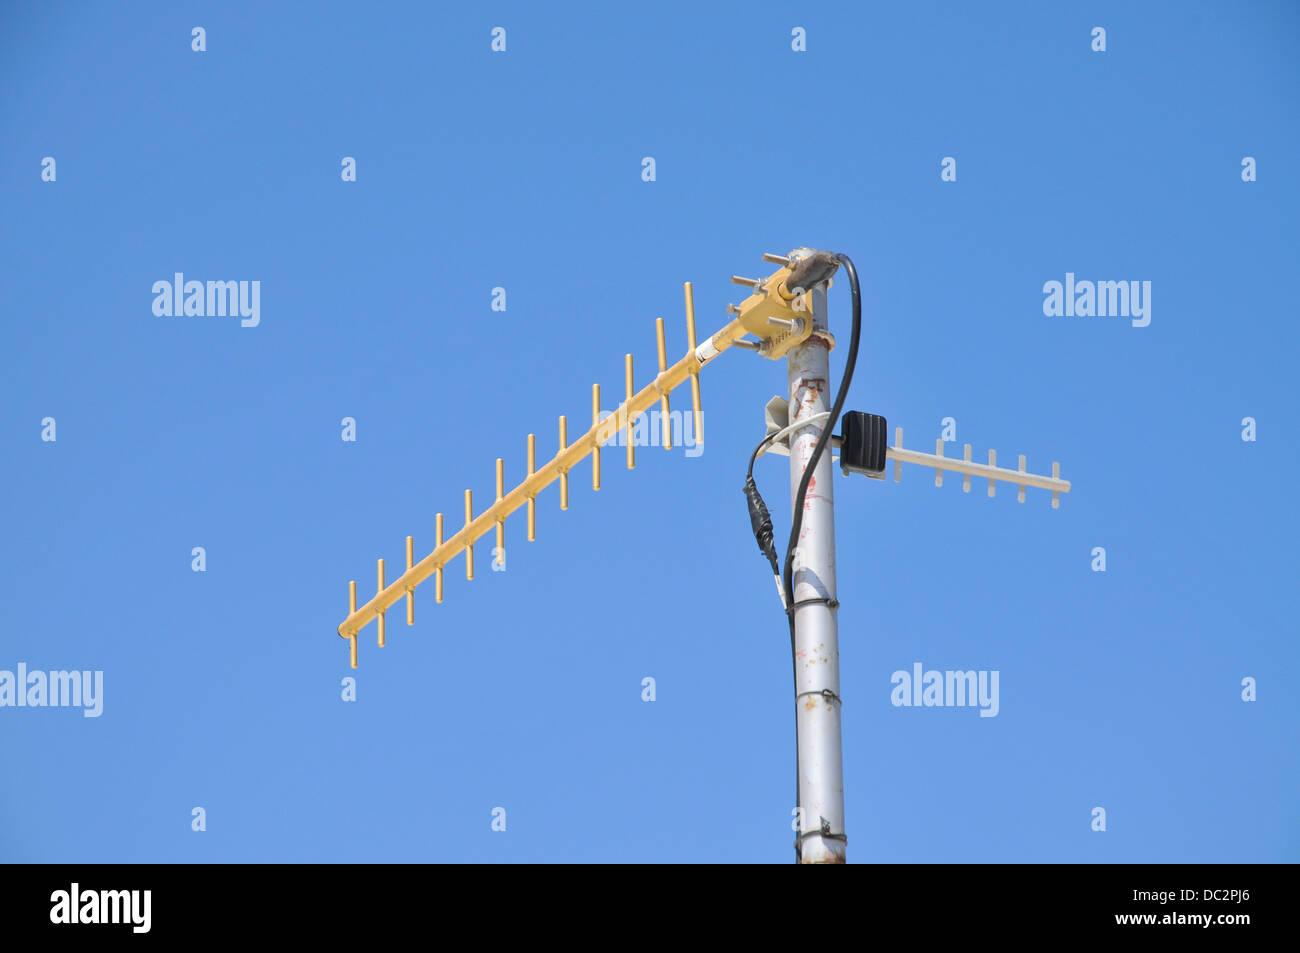 RF Antenna on blue sky background - Stock Image